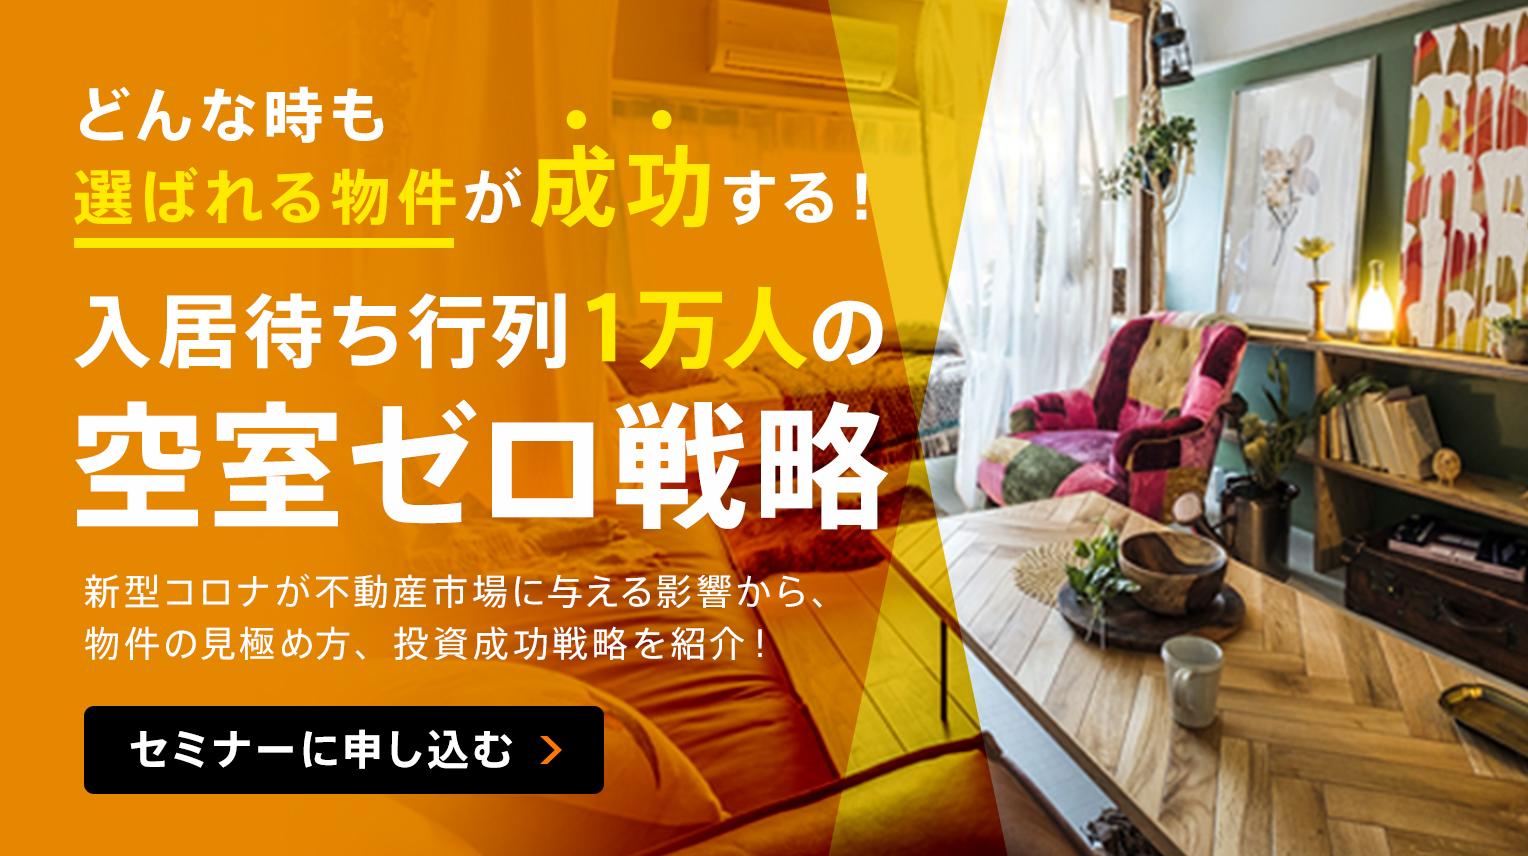 ban_makiguchi@2x-1